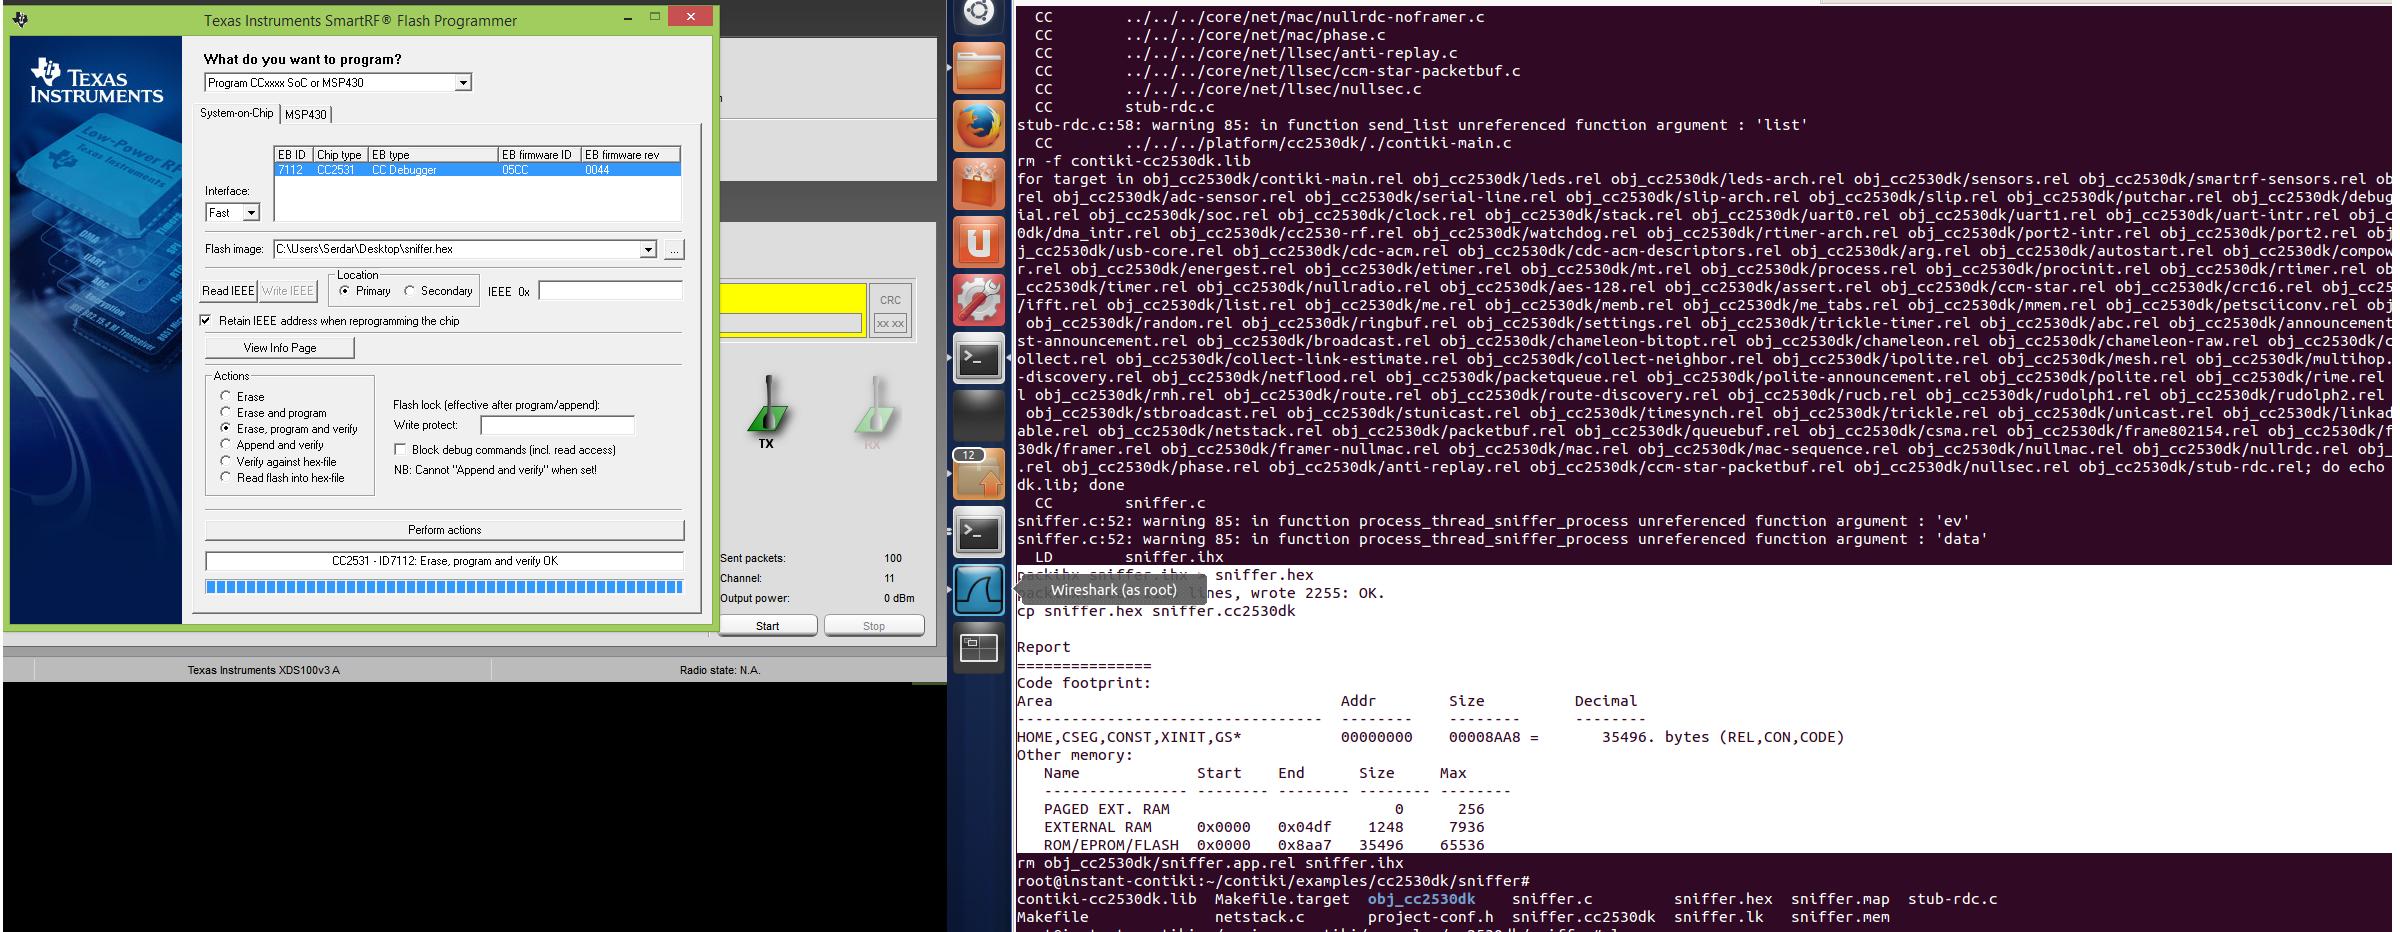 CC2531 usb dongle contiki sniffer firmware - Zigbee & Thread forum